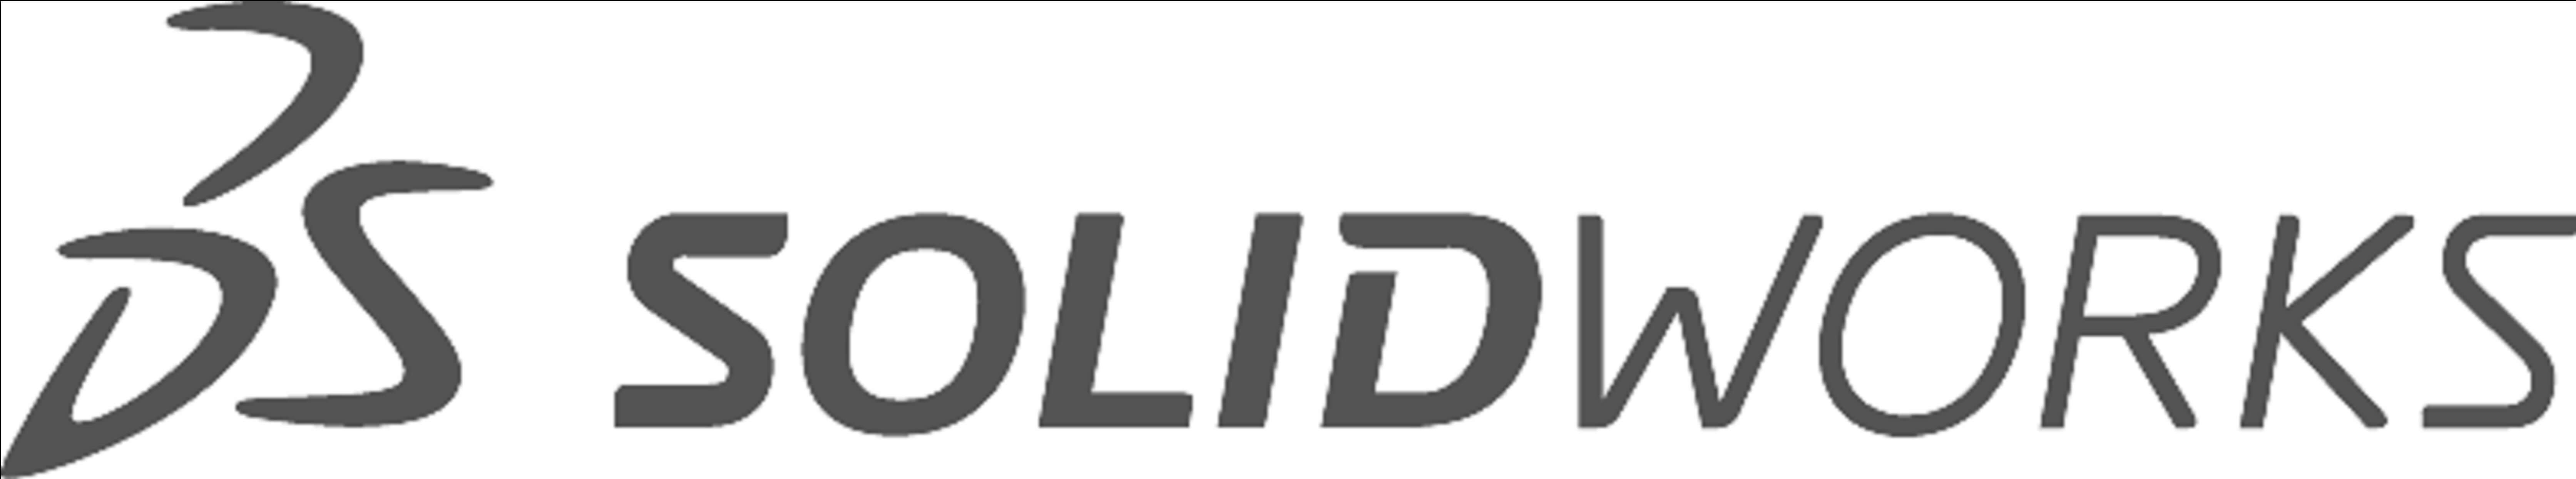 BIM Software - ArCADia